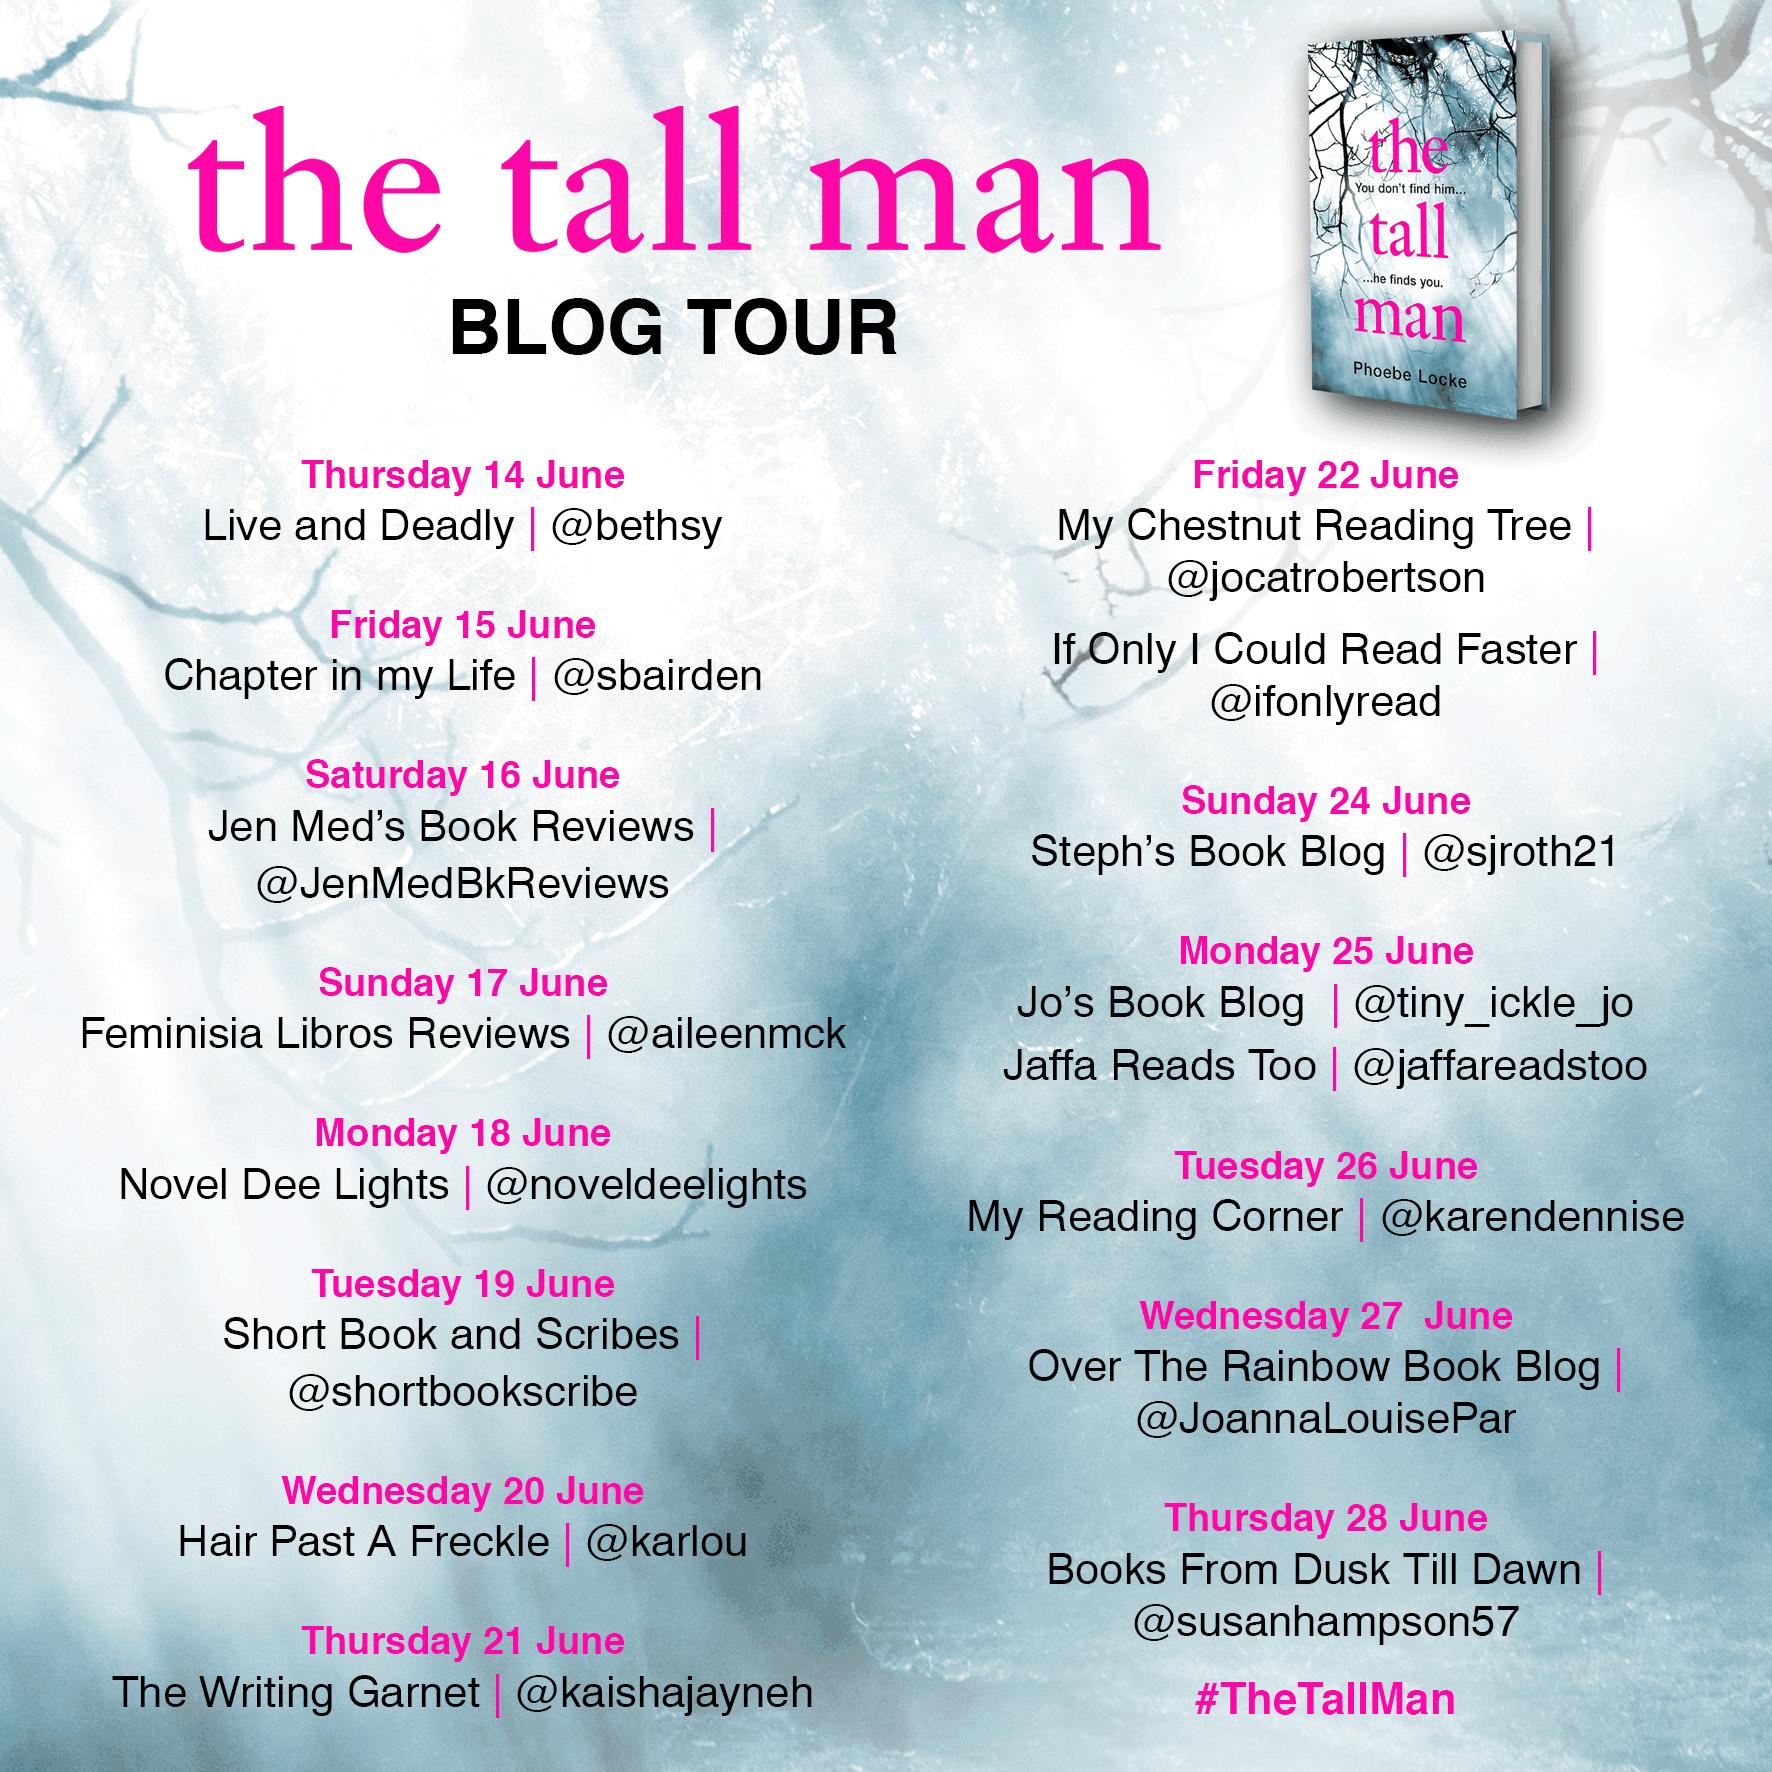 The Tall Man Blog Tour Poster